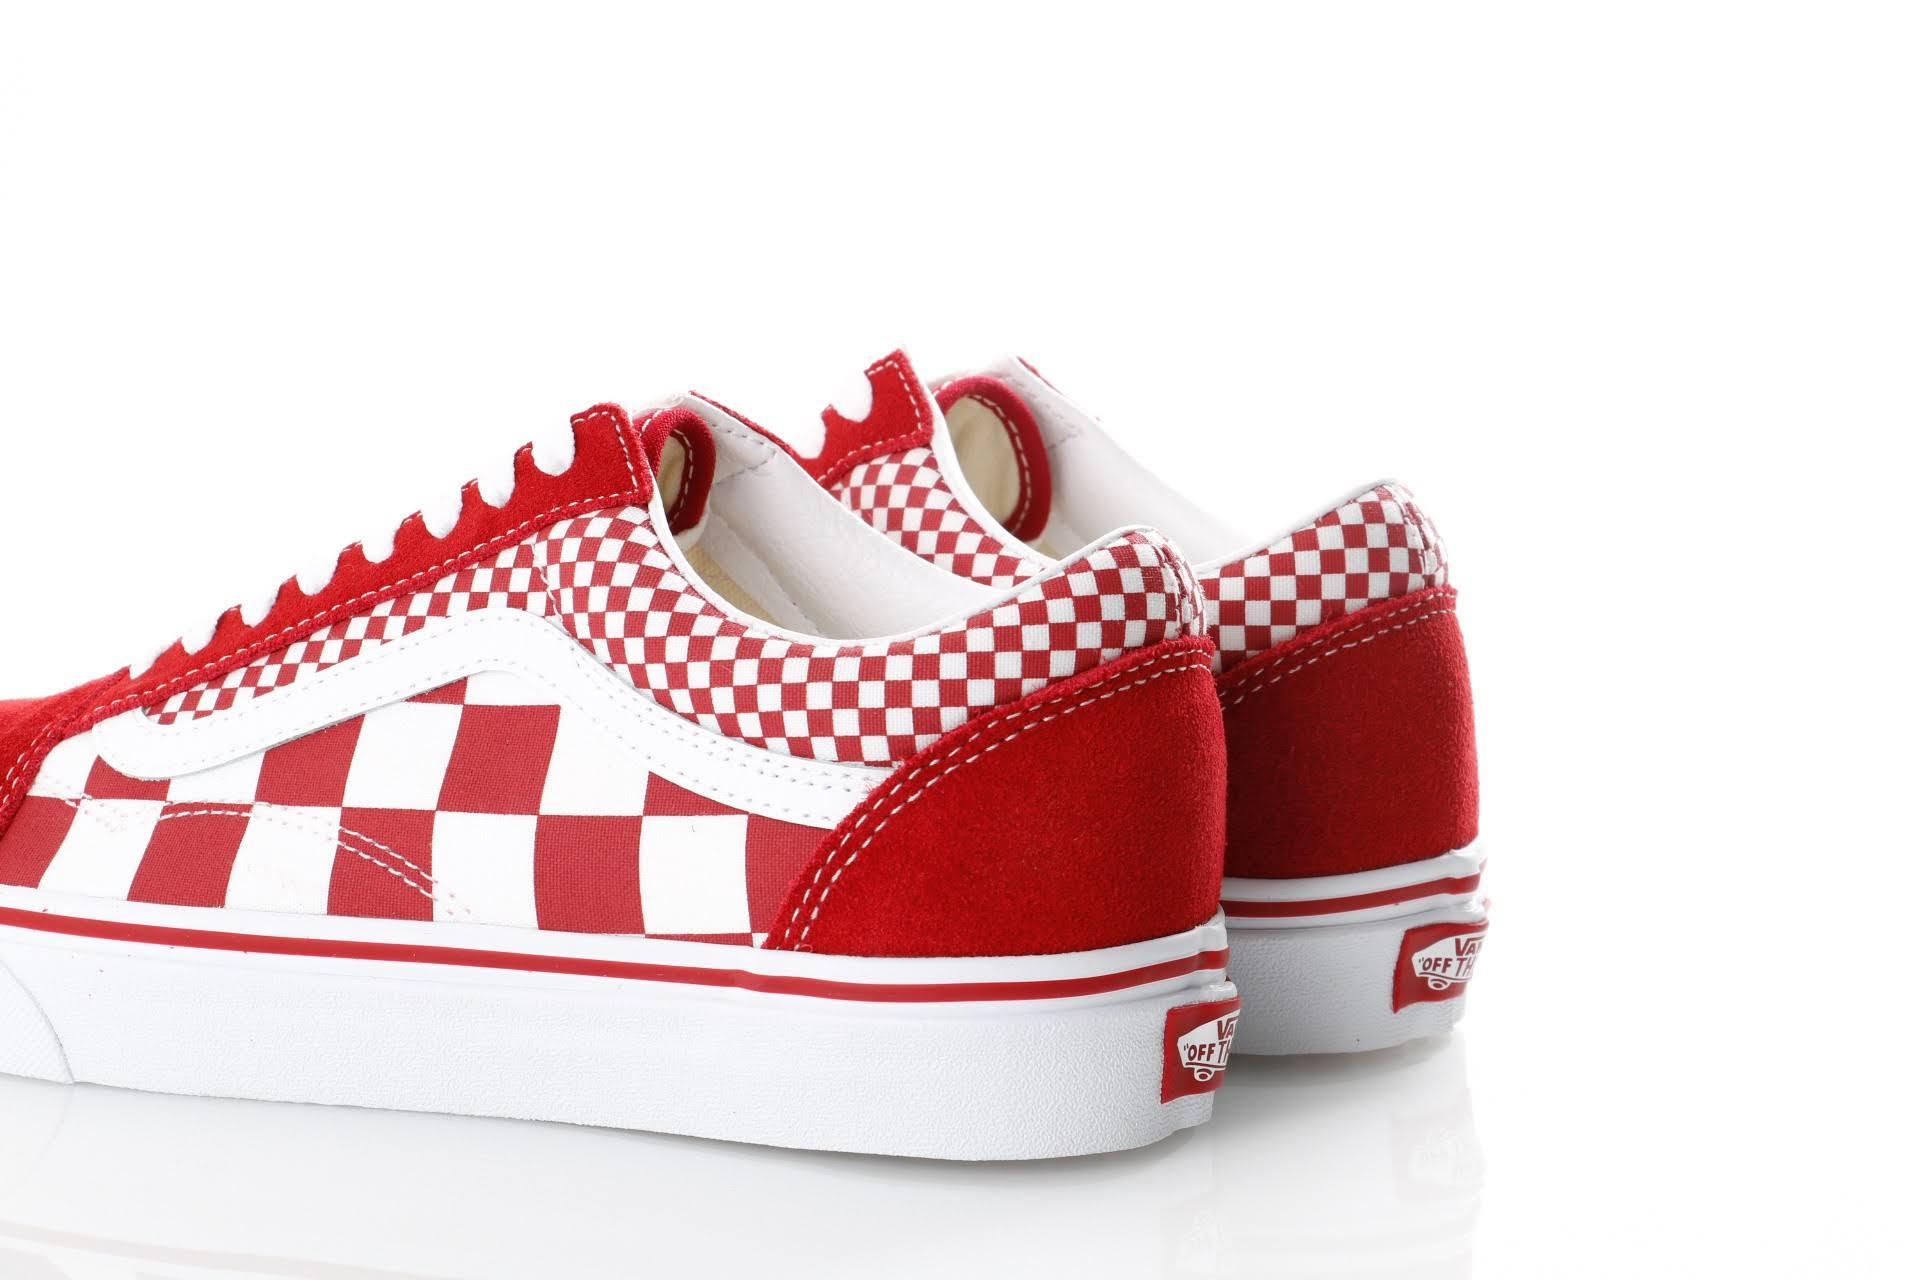 White Old Skool Vn0a38g1vk5 Sneakersmix Ua Vans CheckerChili PepperTrue y80vmwnNO